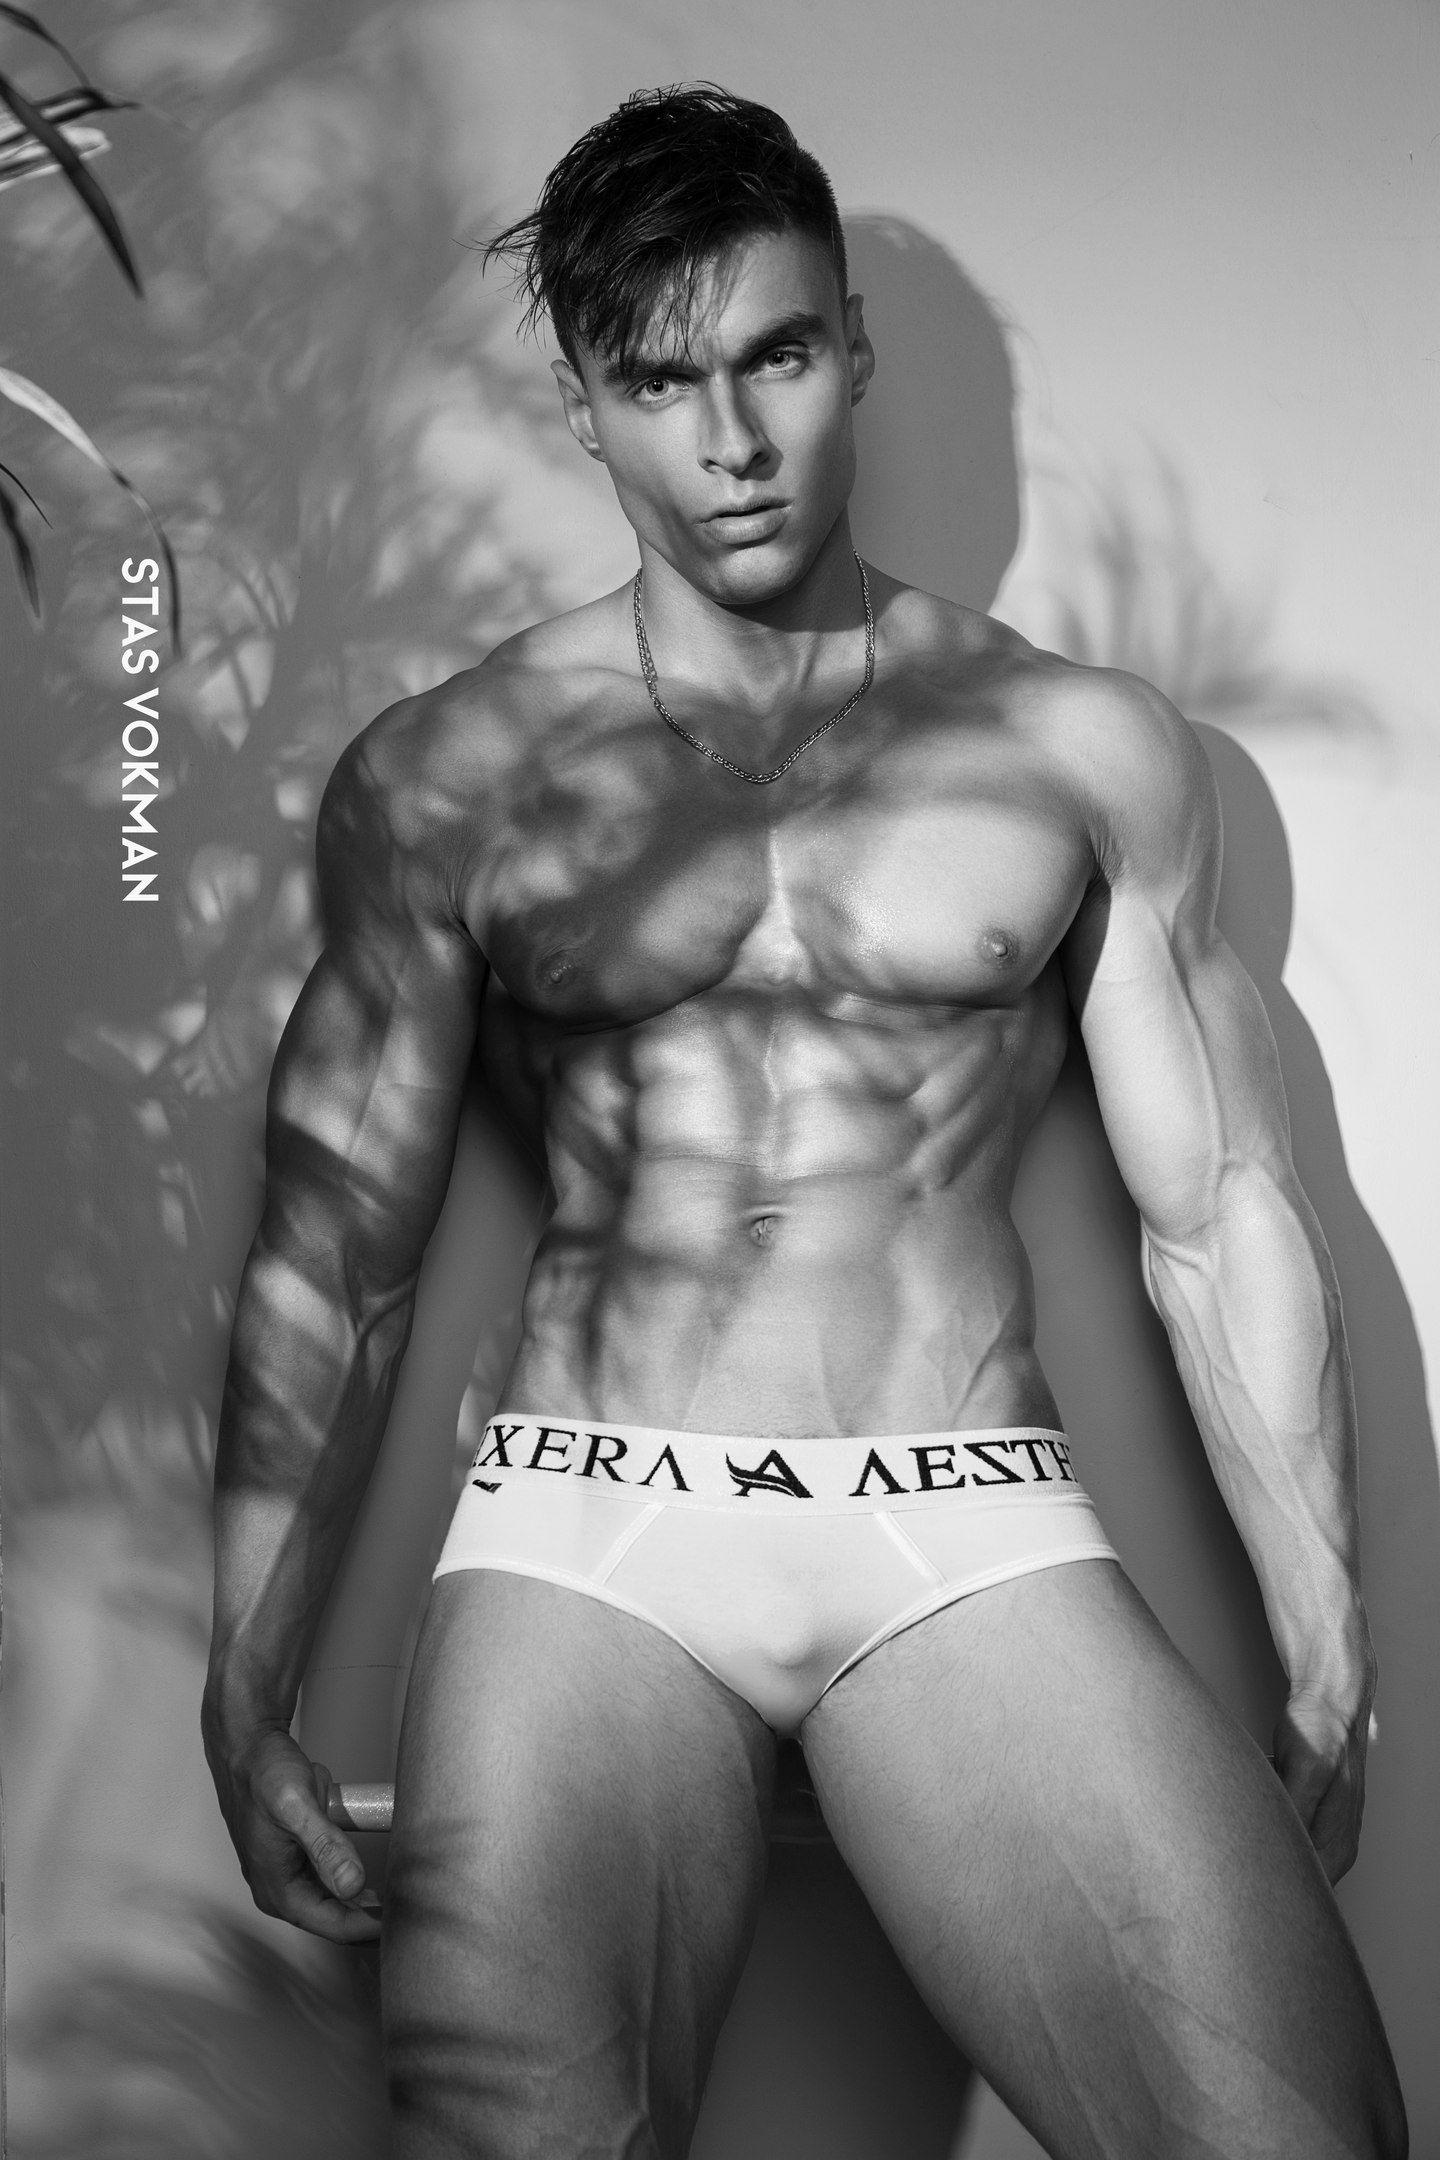 Dmitry Gorobets by Stas Vokman | Models в 2019 г ... Модель Мужчина Русский